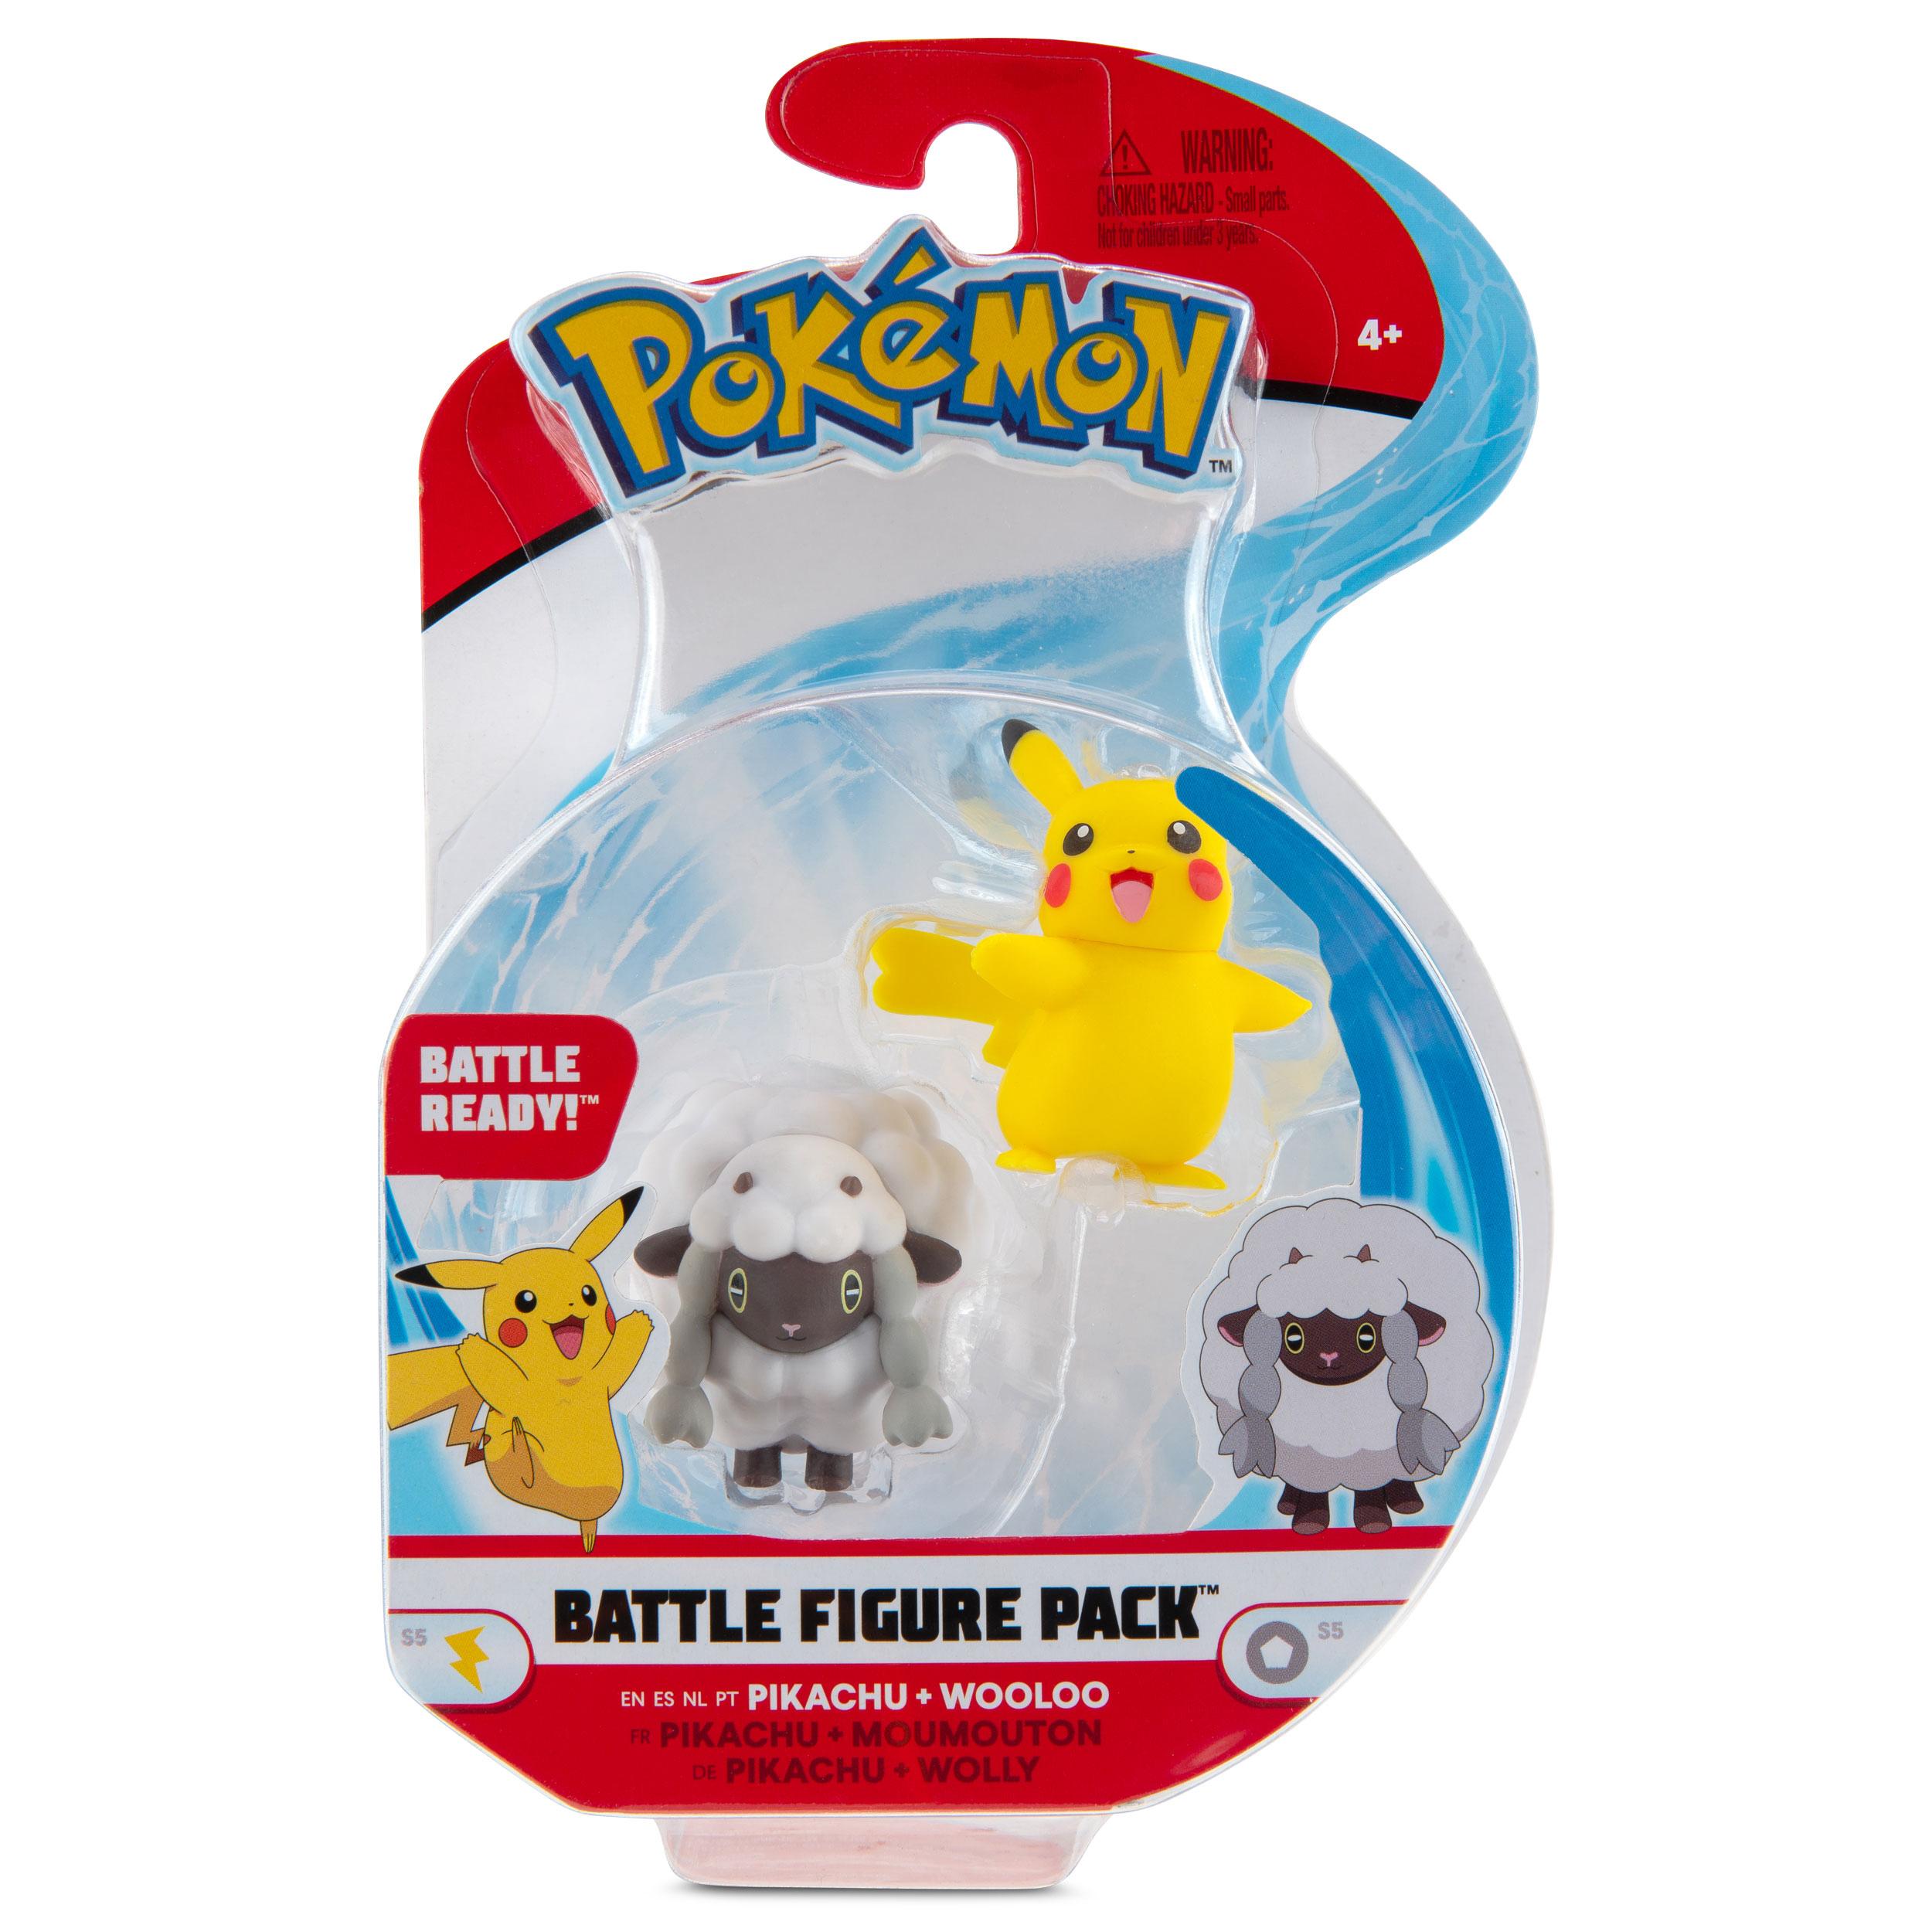 Pokémon - Battle Figure Pack - Pikachu & Wolly